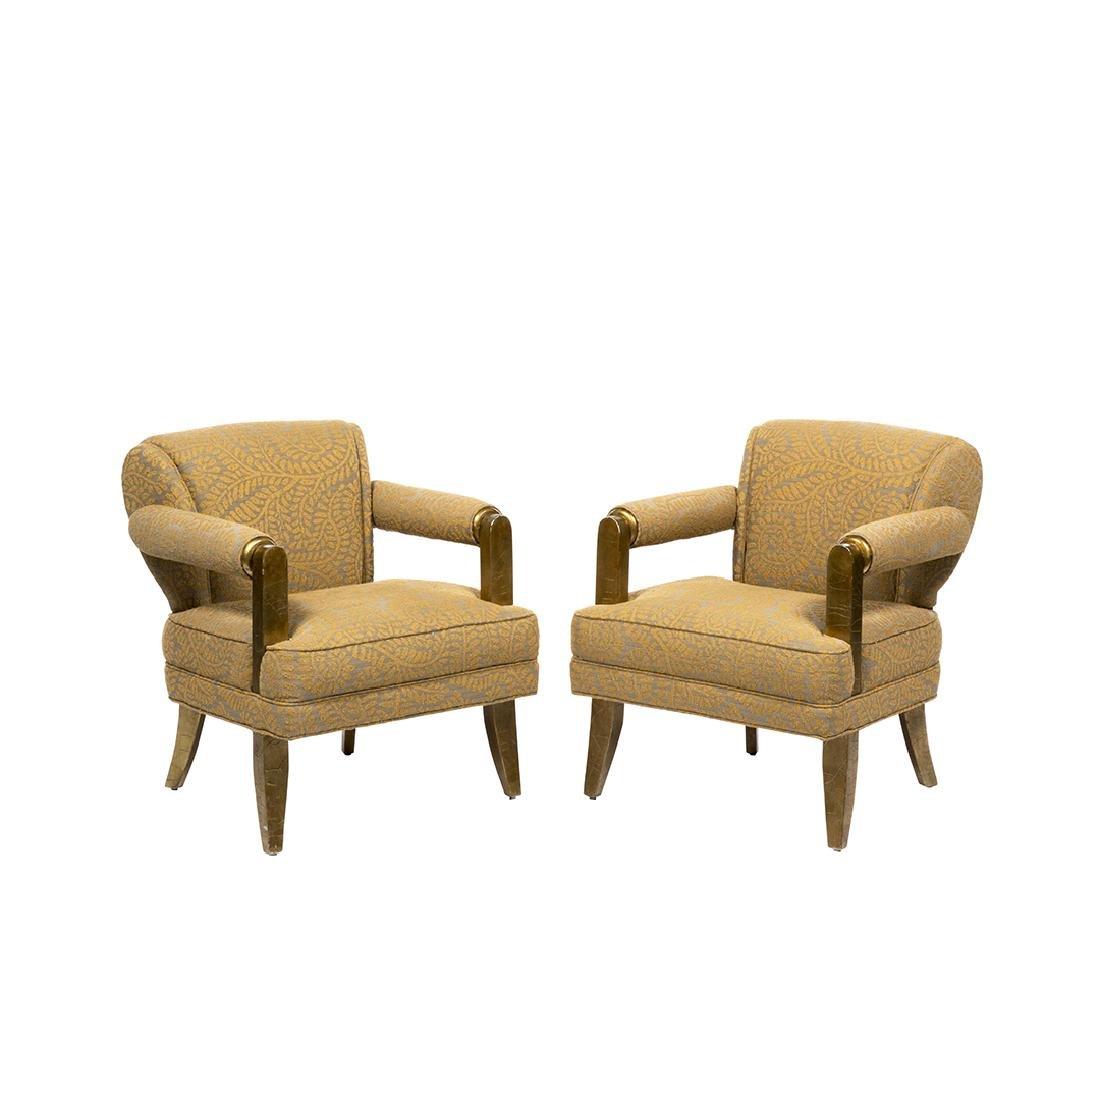 Larry Laslo Club Chairs (2)